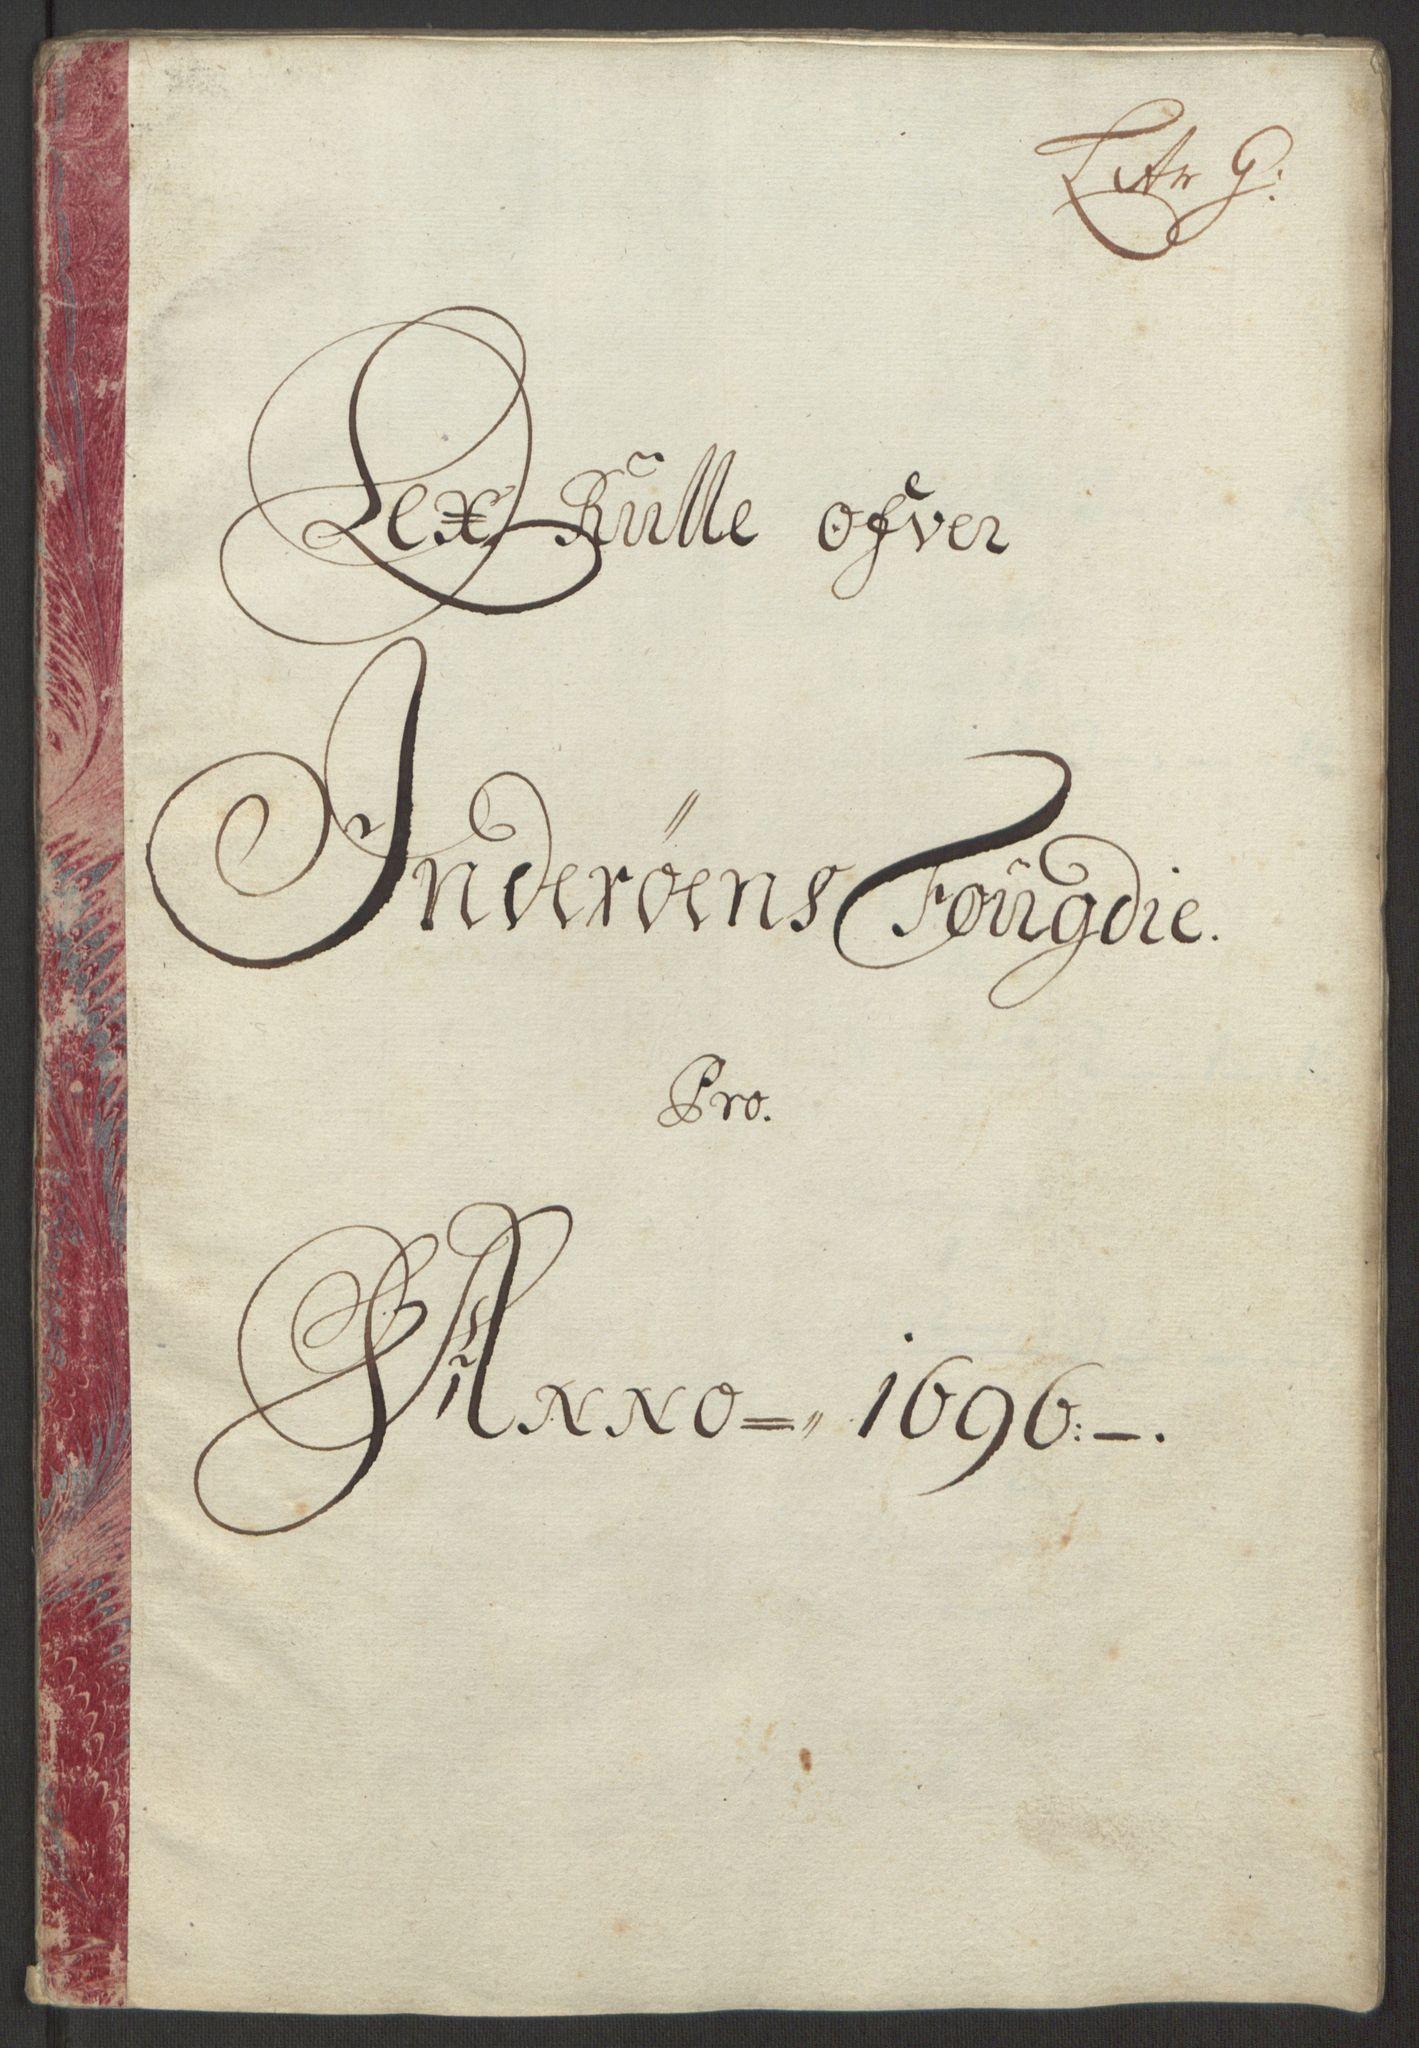 RA, Rentekammeret inntil 1814, Reviderte regnskaper, Fogderegnskap, R63/L4309: Fogderegnskap Inderøy, 1695-1697, s. 254